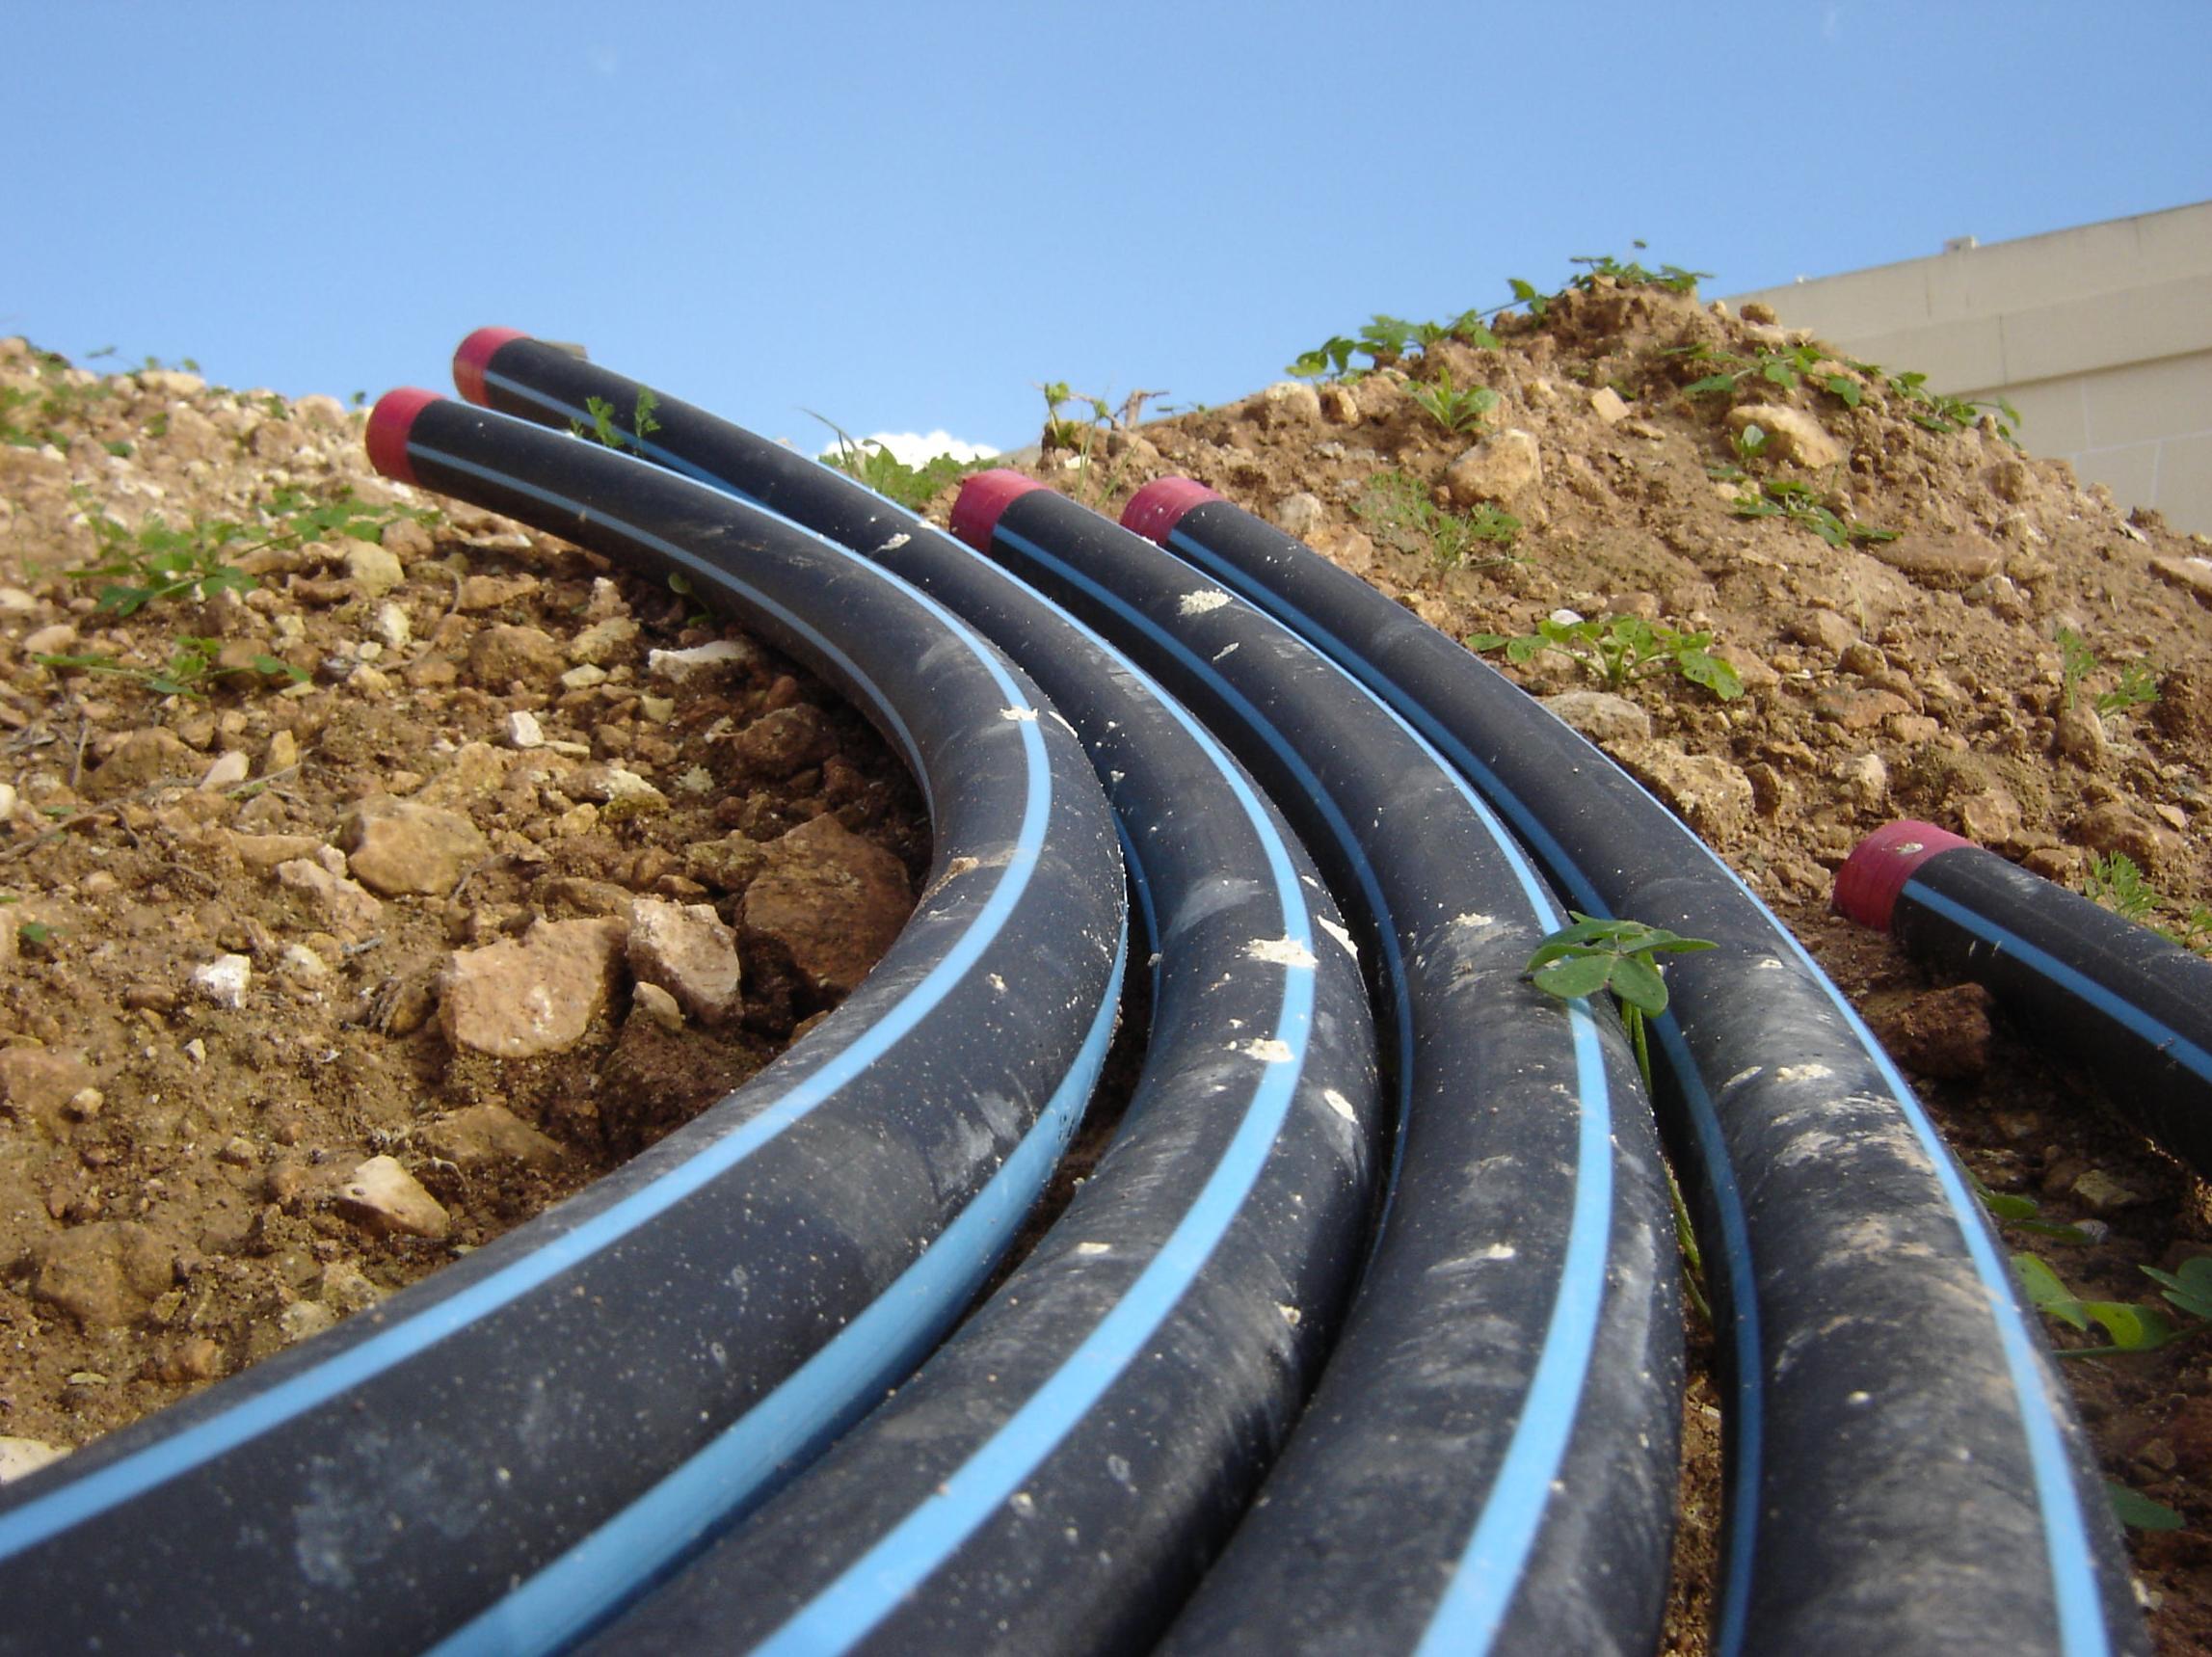 Redes de abastecimiento de agua